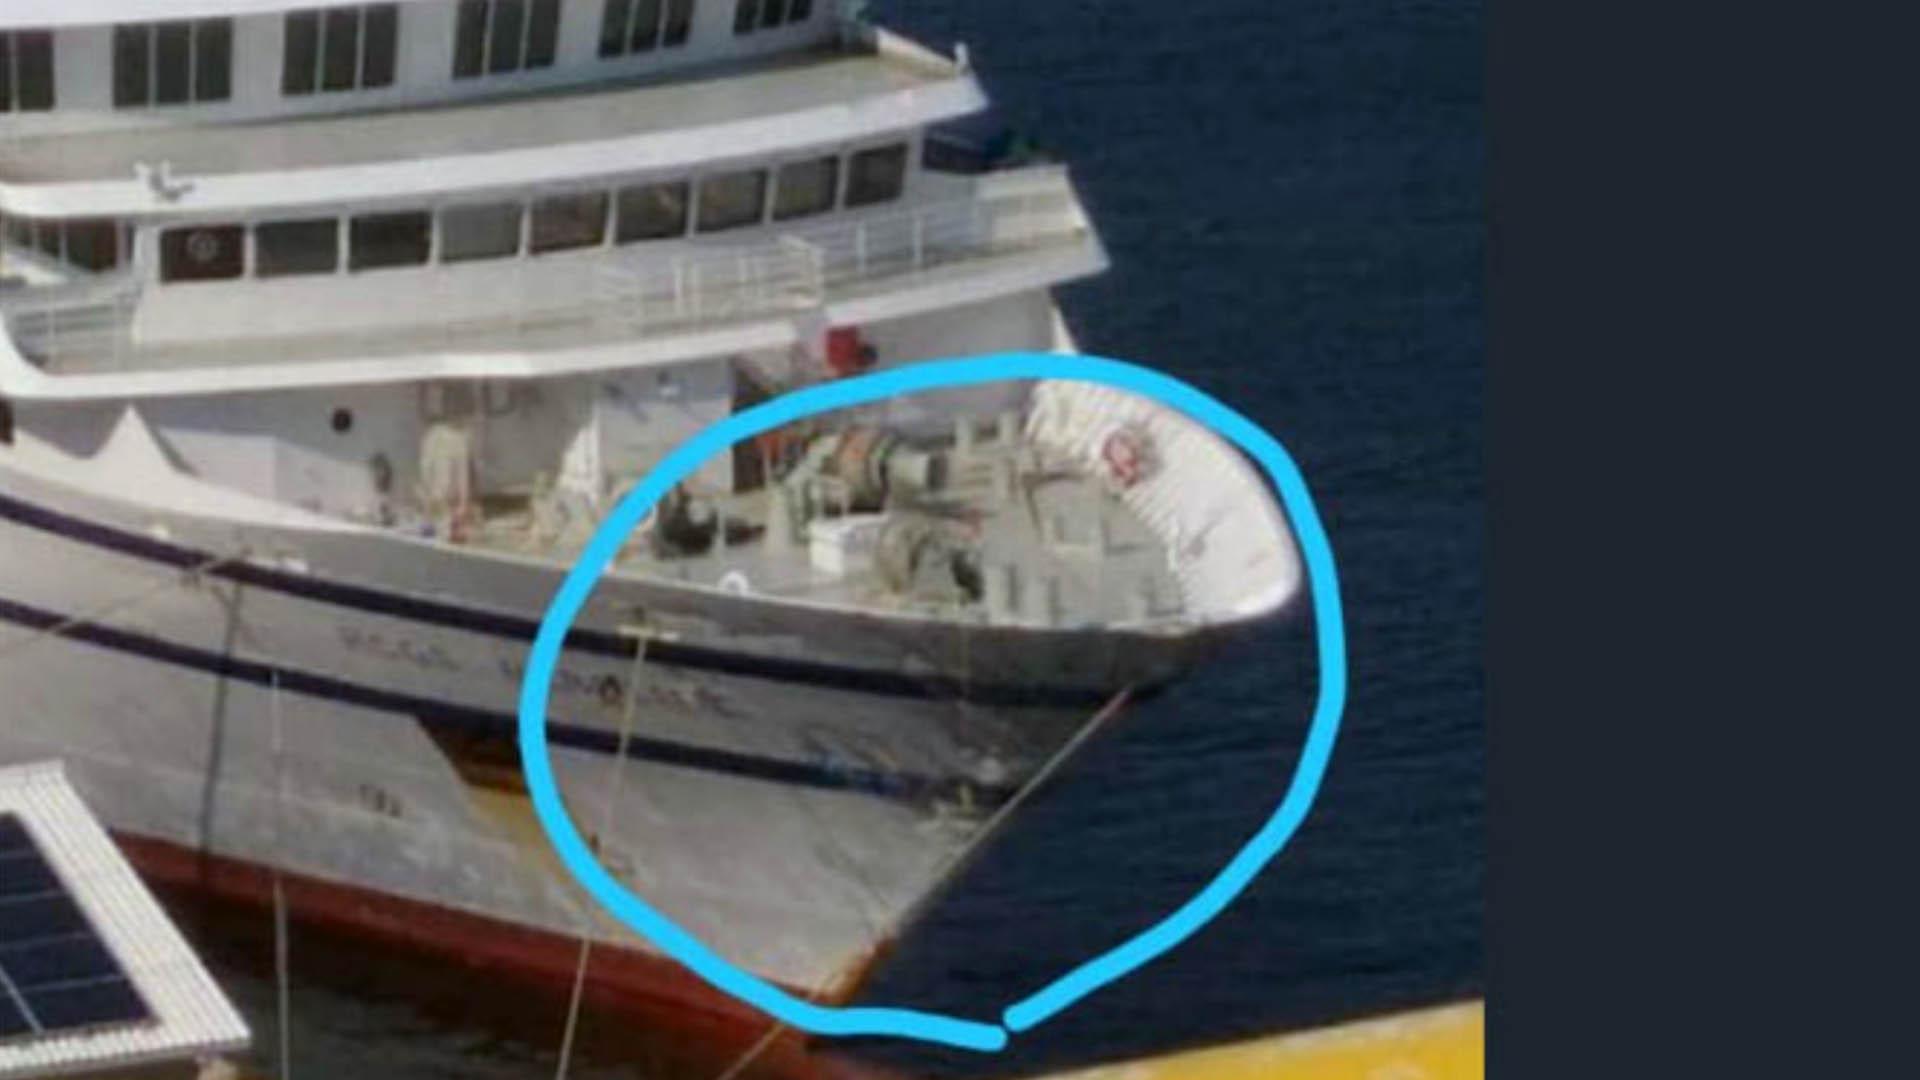 Runrunes de Bocaranda, el barco con la imagen de proa